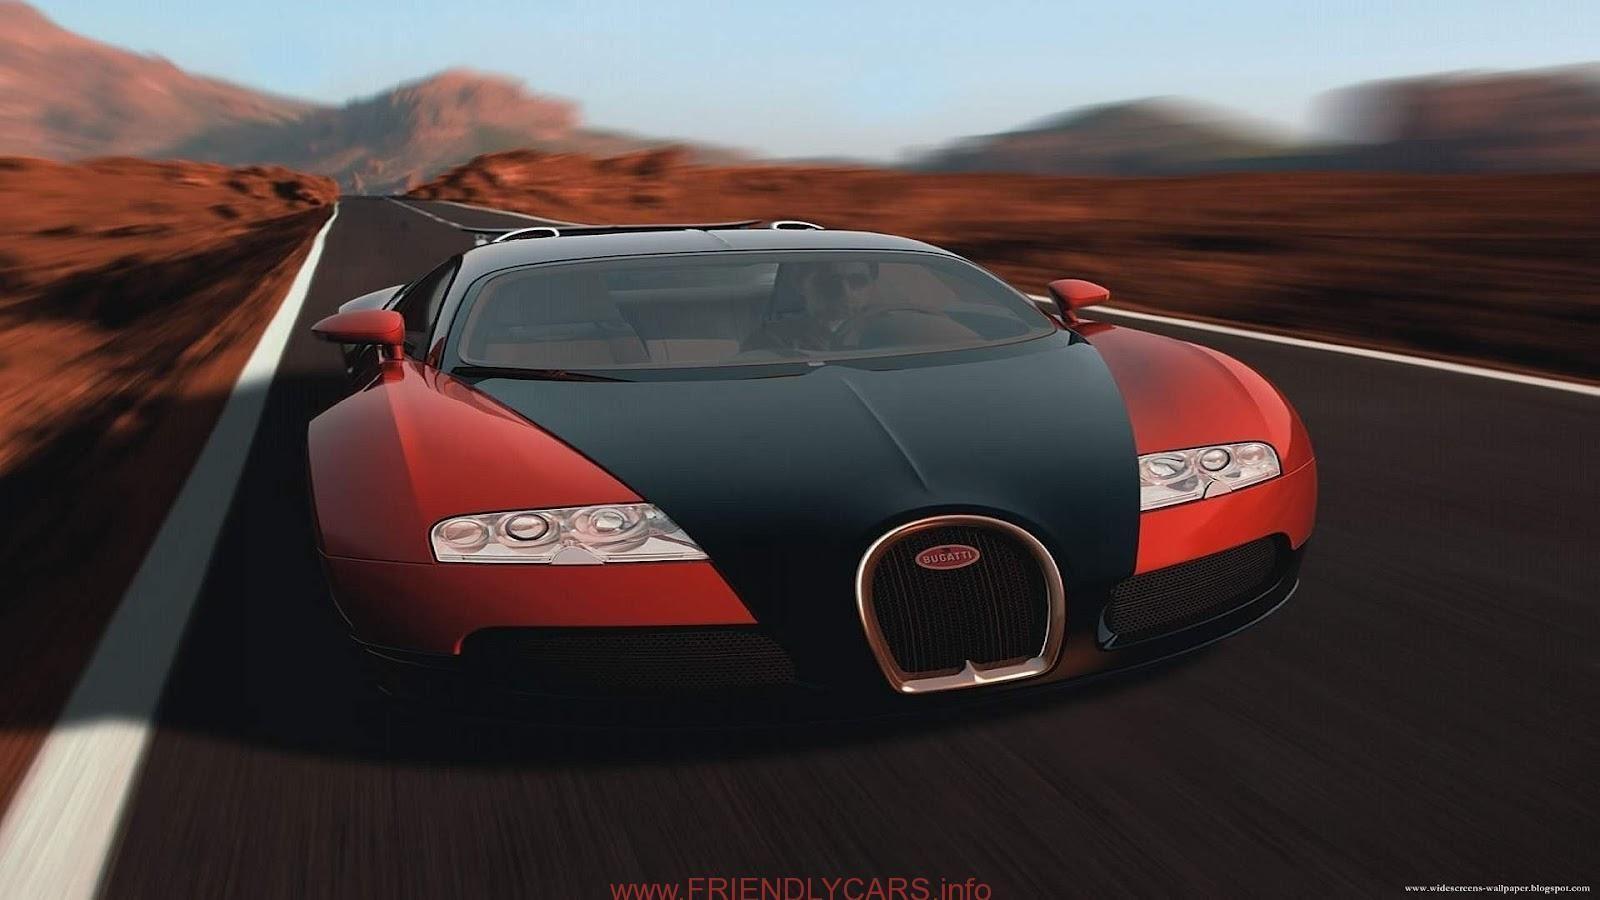 Red Bugatti Wallpapers Top Free Red Bugatti Backgrounds Wallpaperaccess